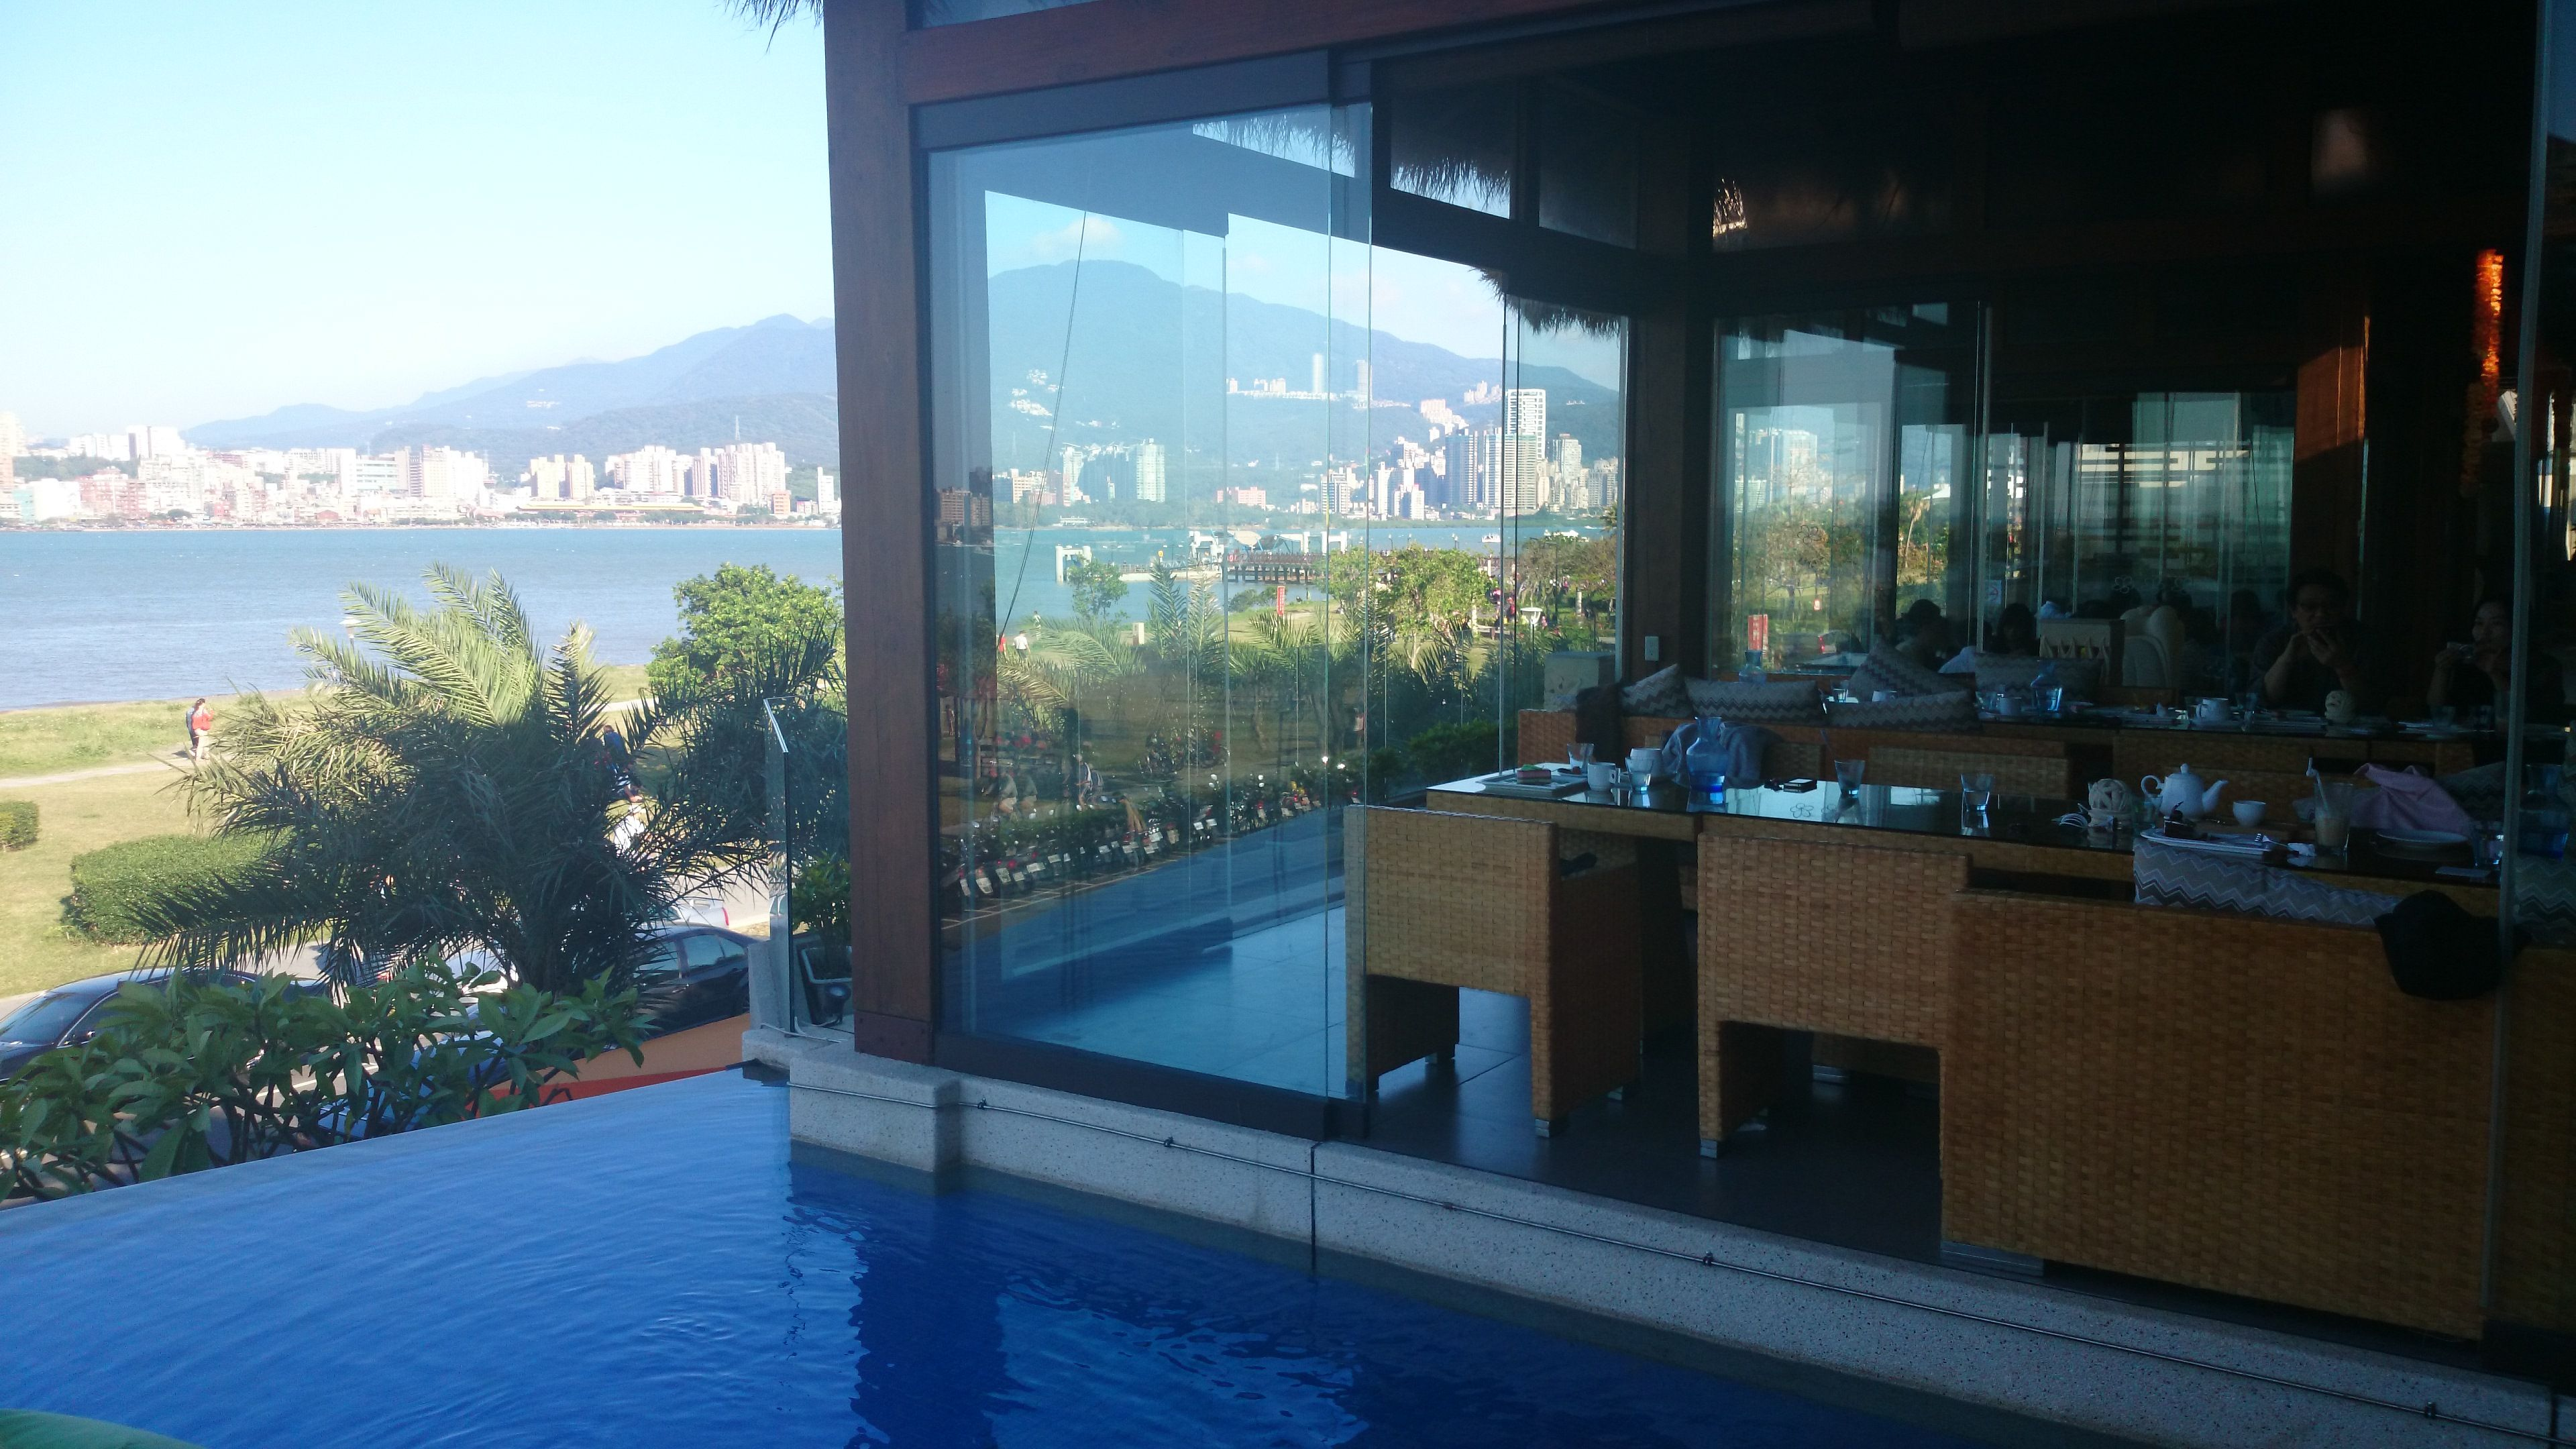 臺北-八里 / BALI 水岸四季景觀餐廳   House styles, Outdoor decor, Mansions